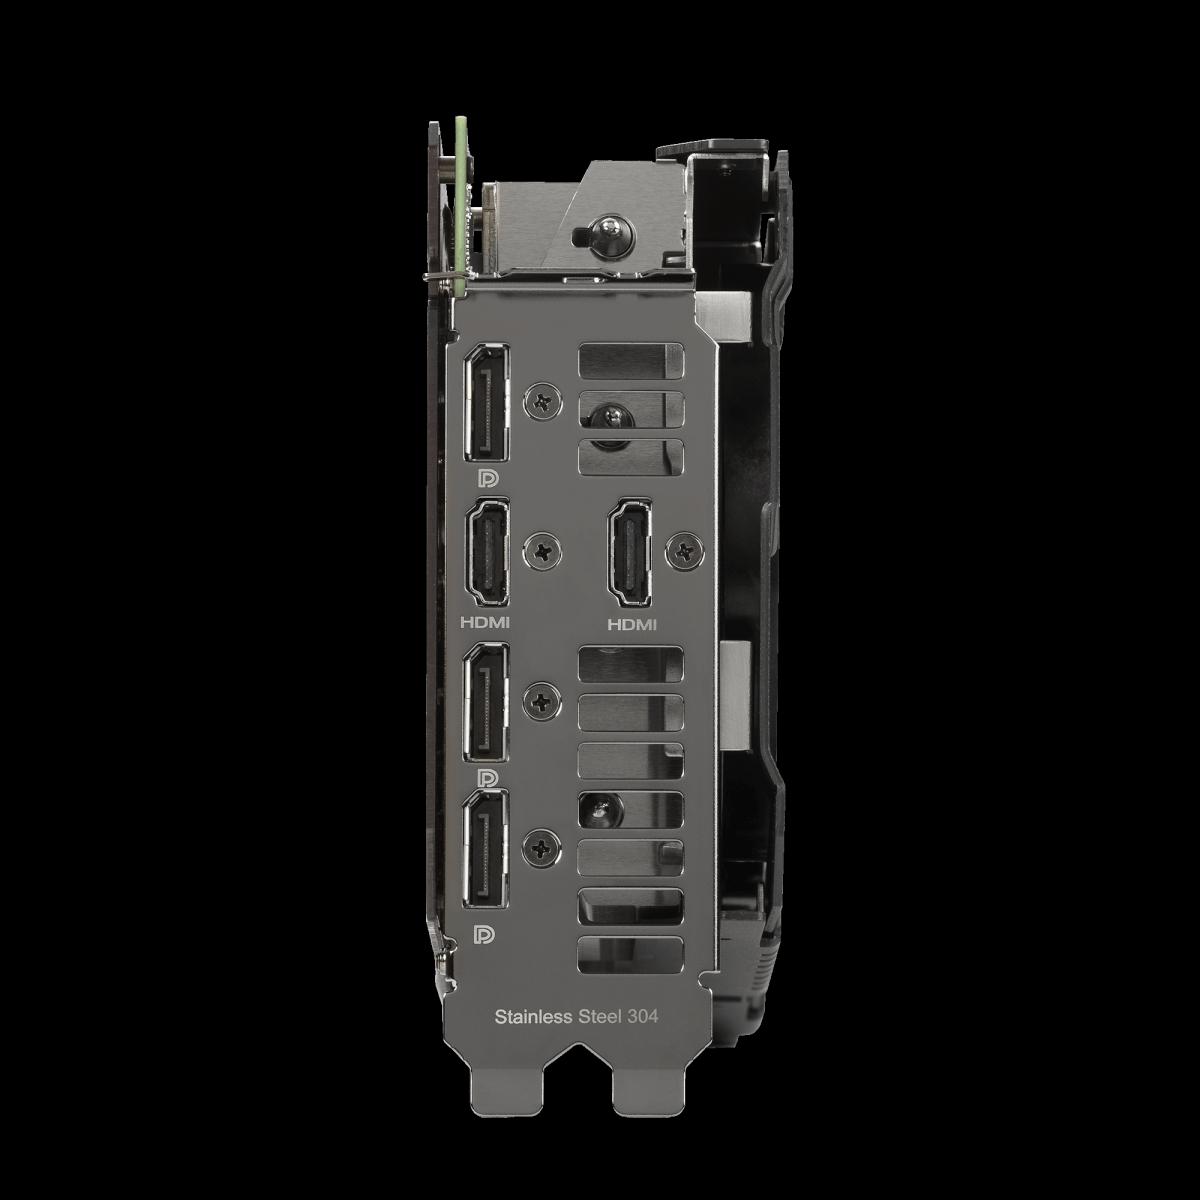 Placa de Vídeo Asus TUF Gaming GeForce RTX 3060 OC, 12GB, GDDR6, 192bit, LHR, 90YV0GC0-M0NA00